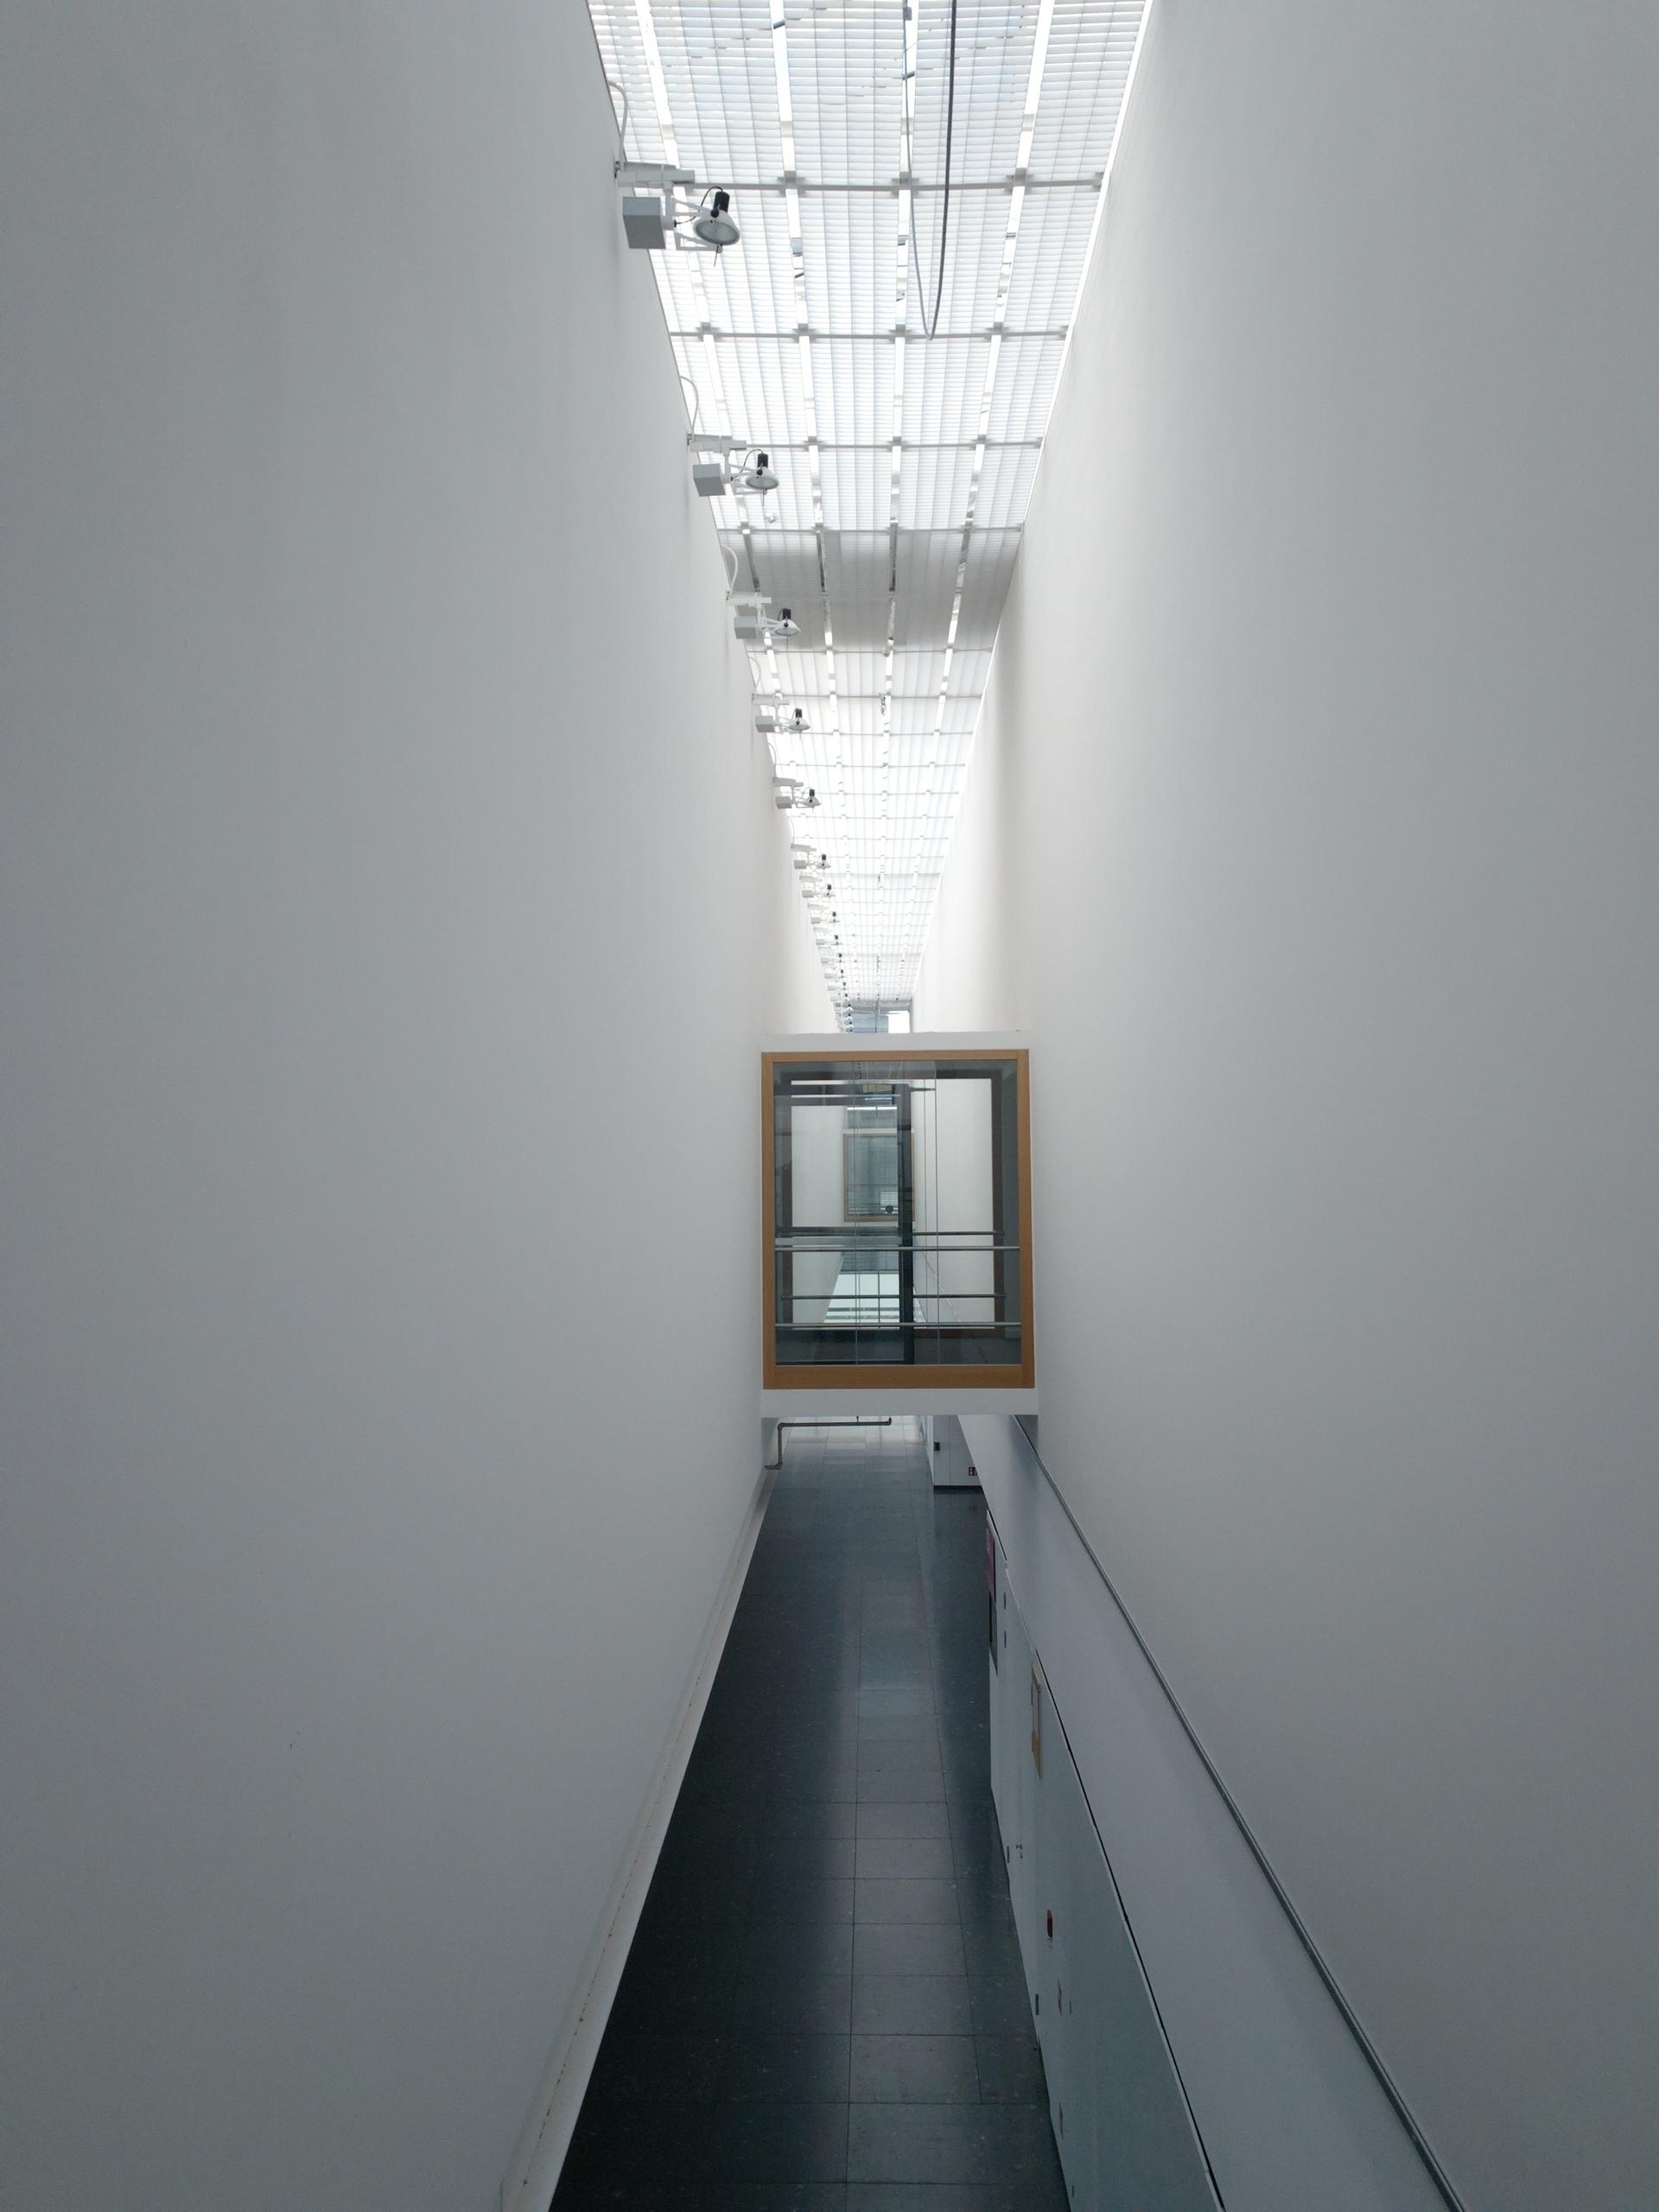 Golem - photography, architecture - marcushammerschmitt | ello